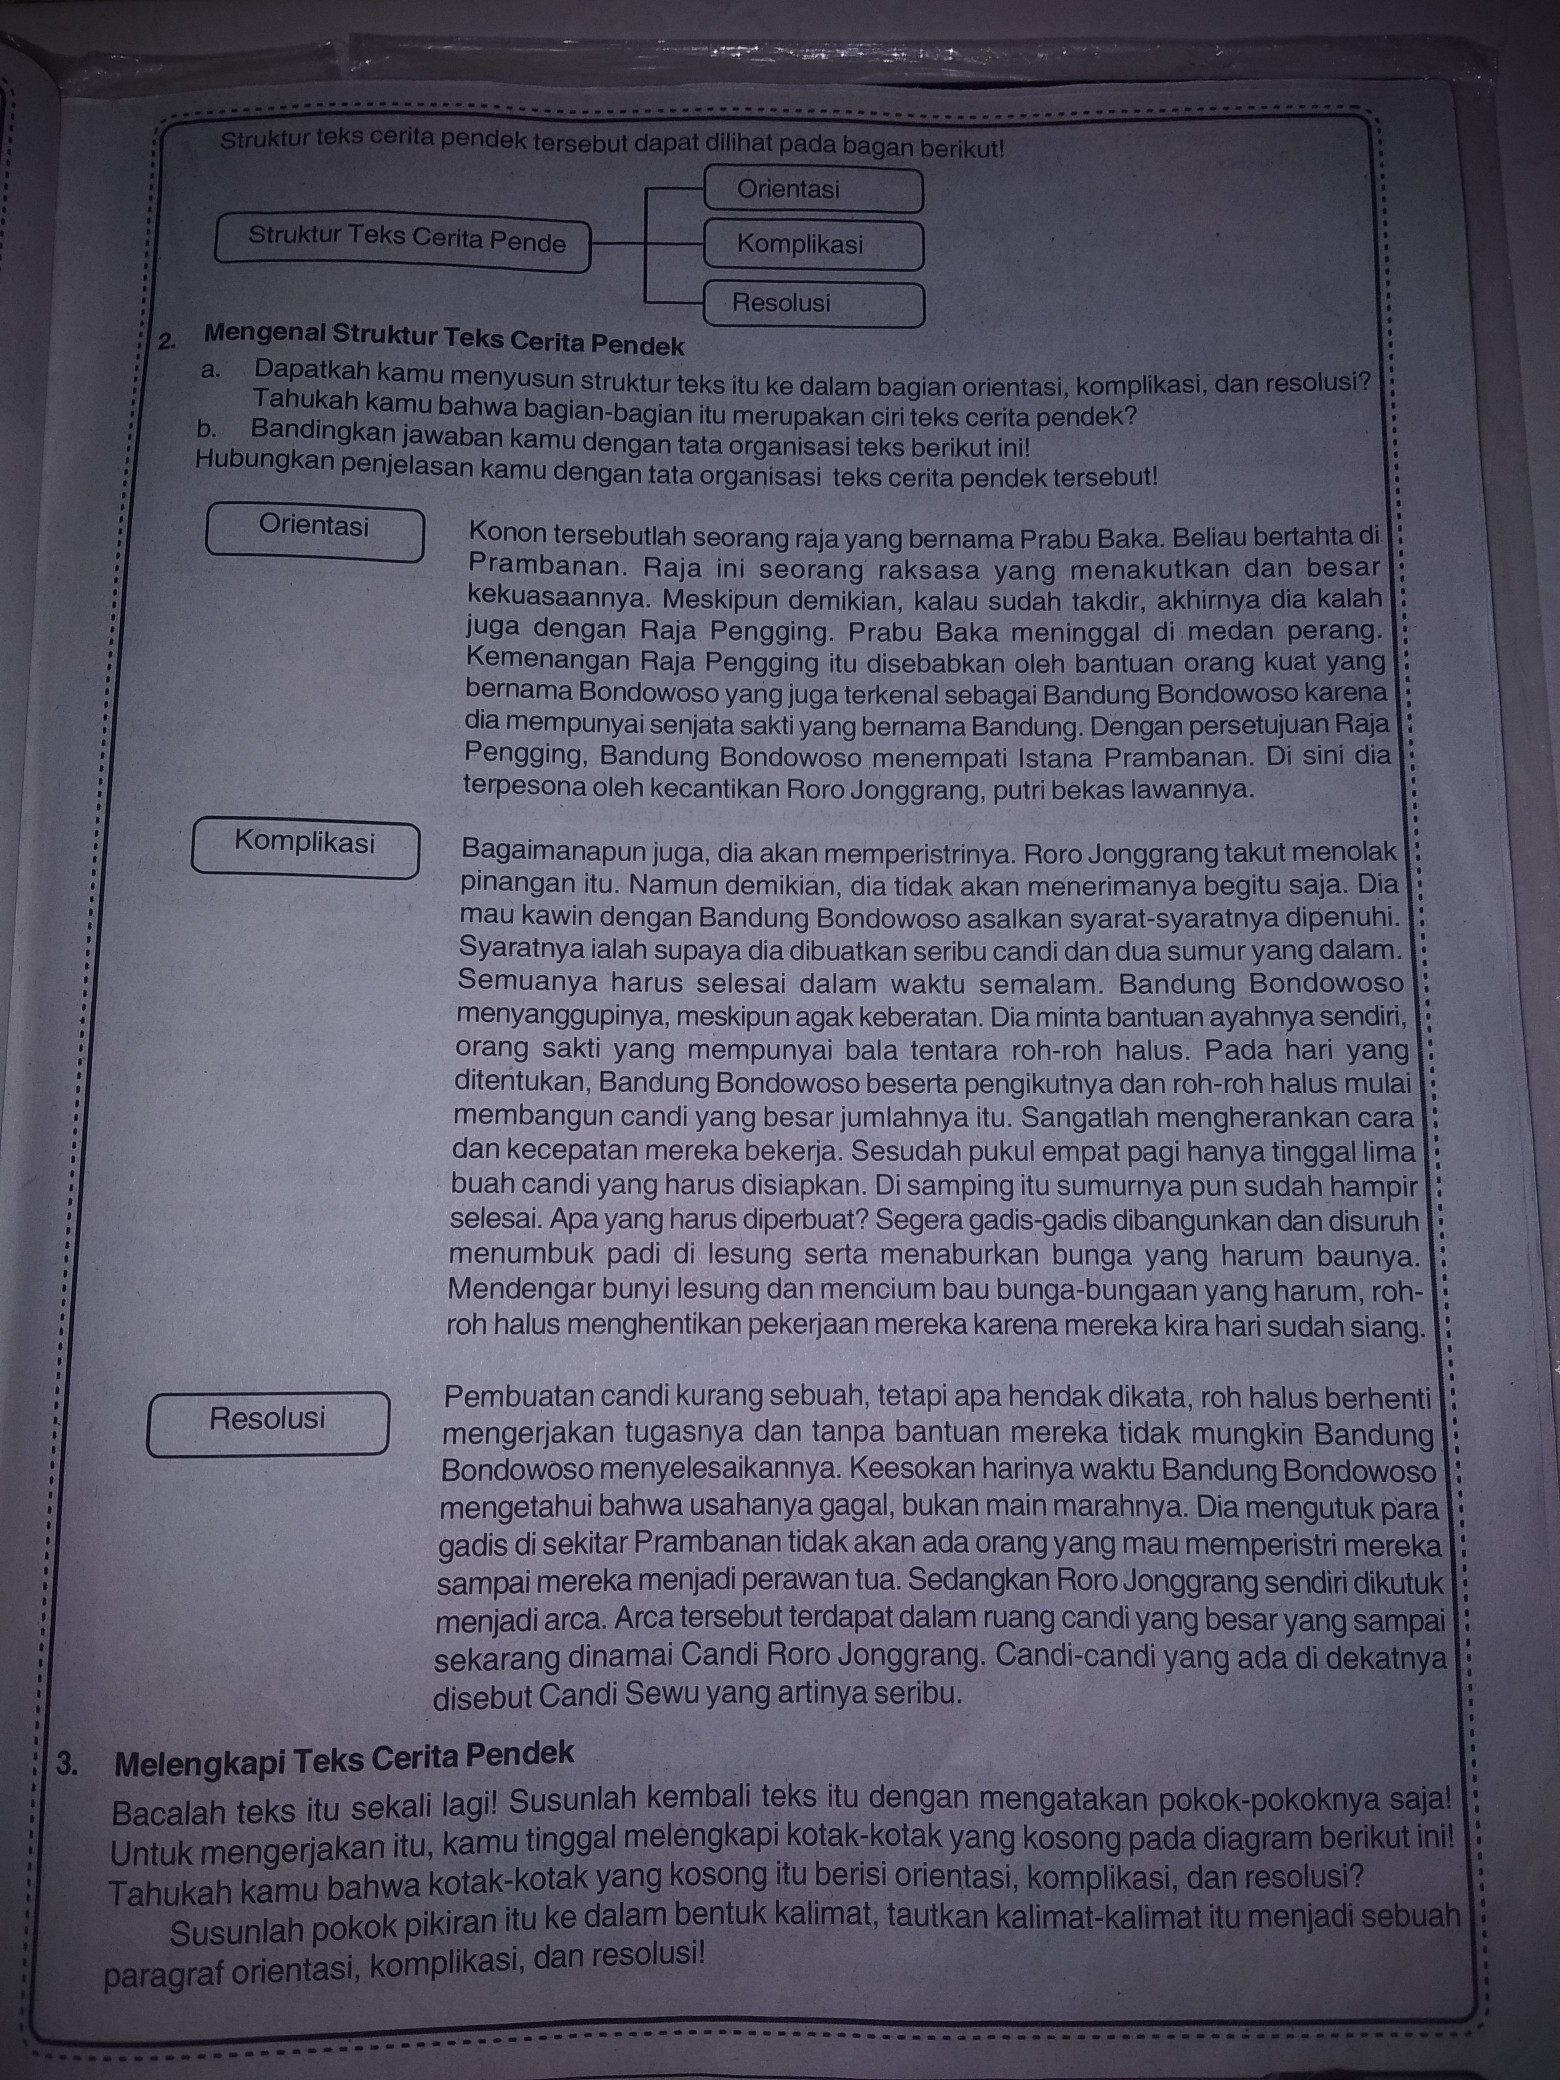 Struktur Teks Cerpen : struktur, cerpen, Contoh, Cerpen, Beserta, Strukturnya, Brainly.co.id